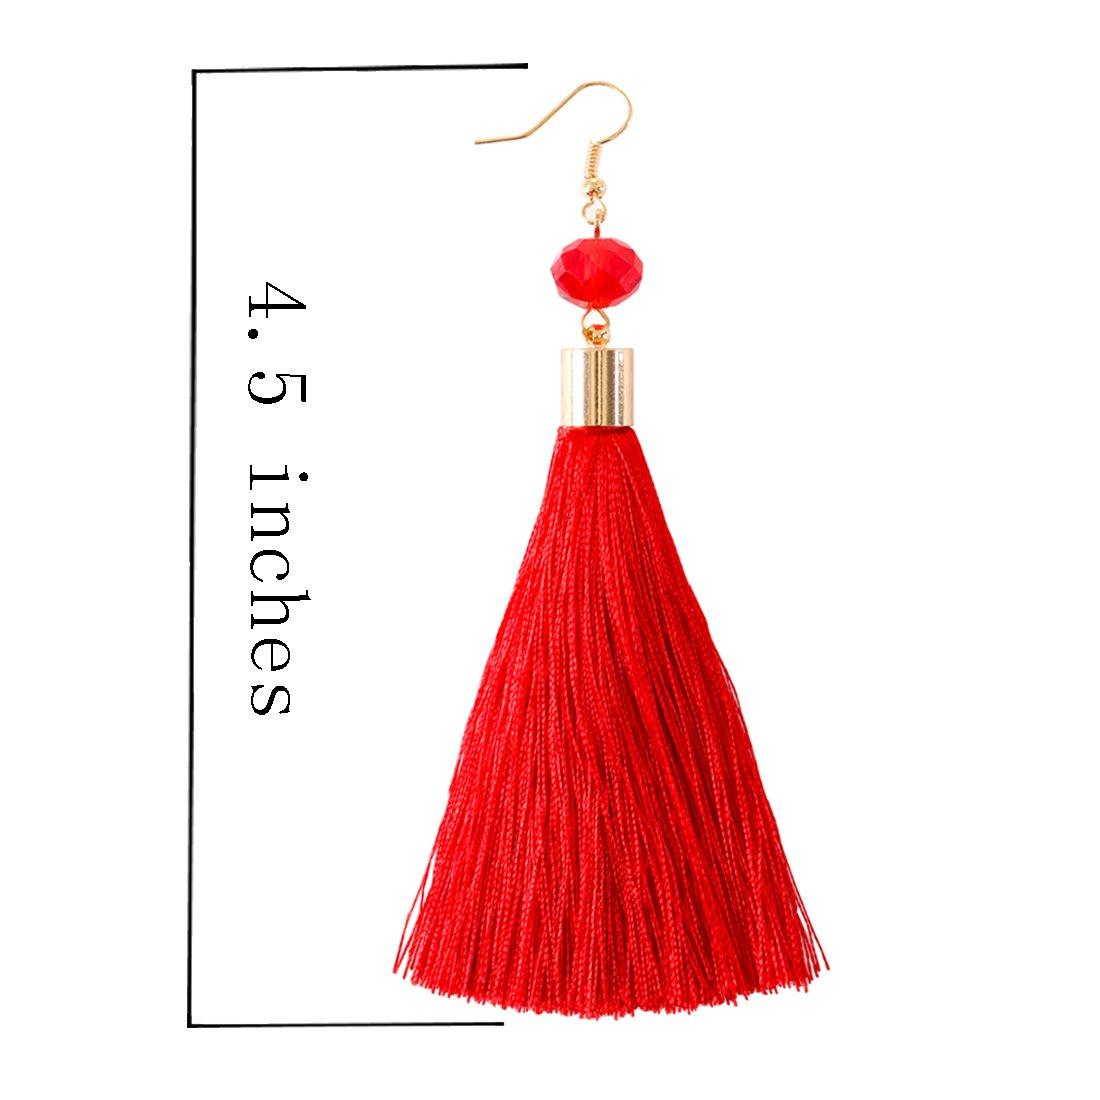 0c143f875 Amazon.com: NLCAC Long Tassel Drop Earrings Red Dangle with Ball Hook Fringe  Earring for Women's Fashion Jewelry: Jewelry